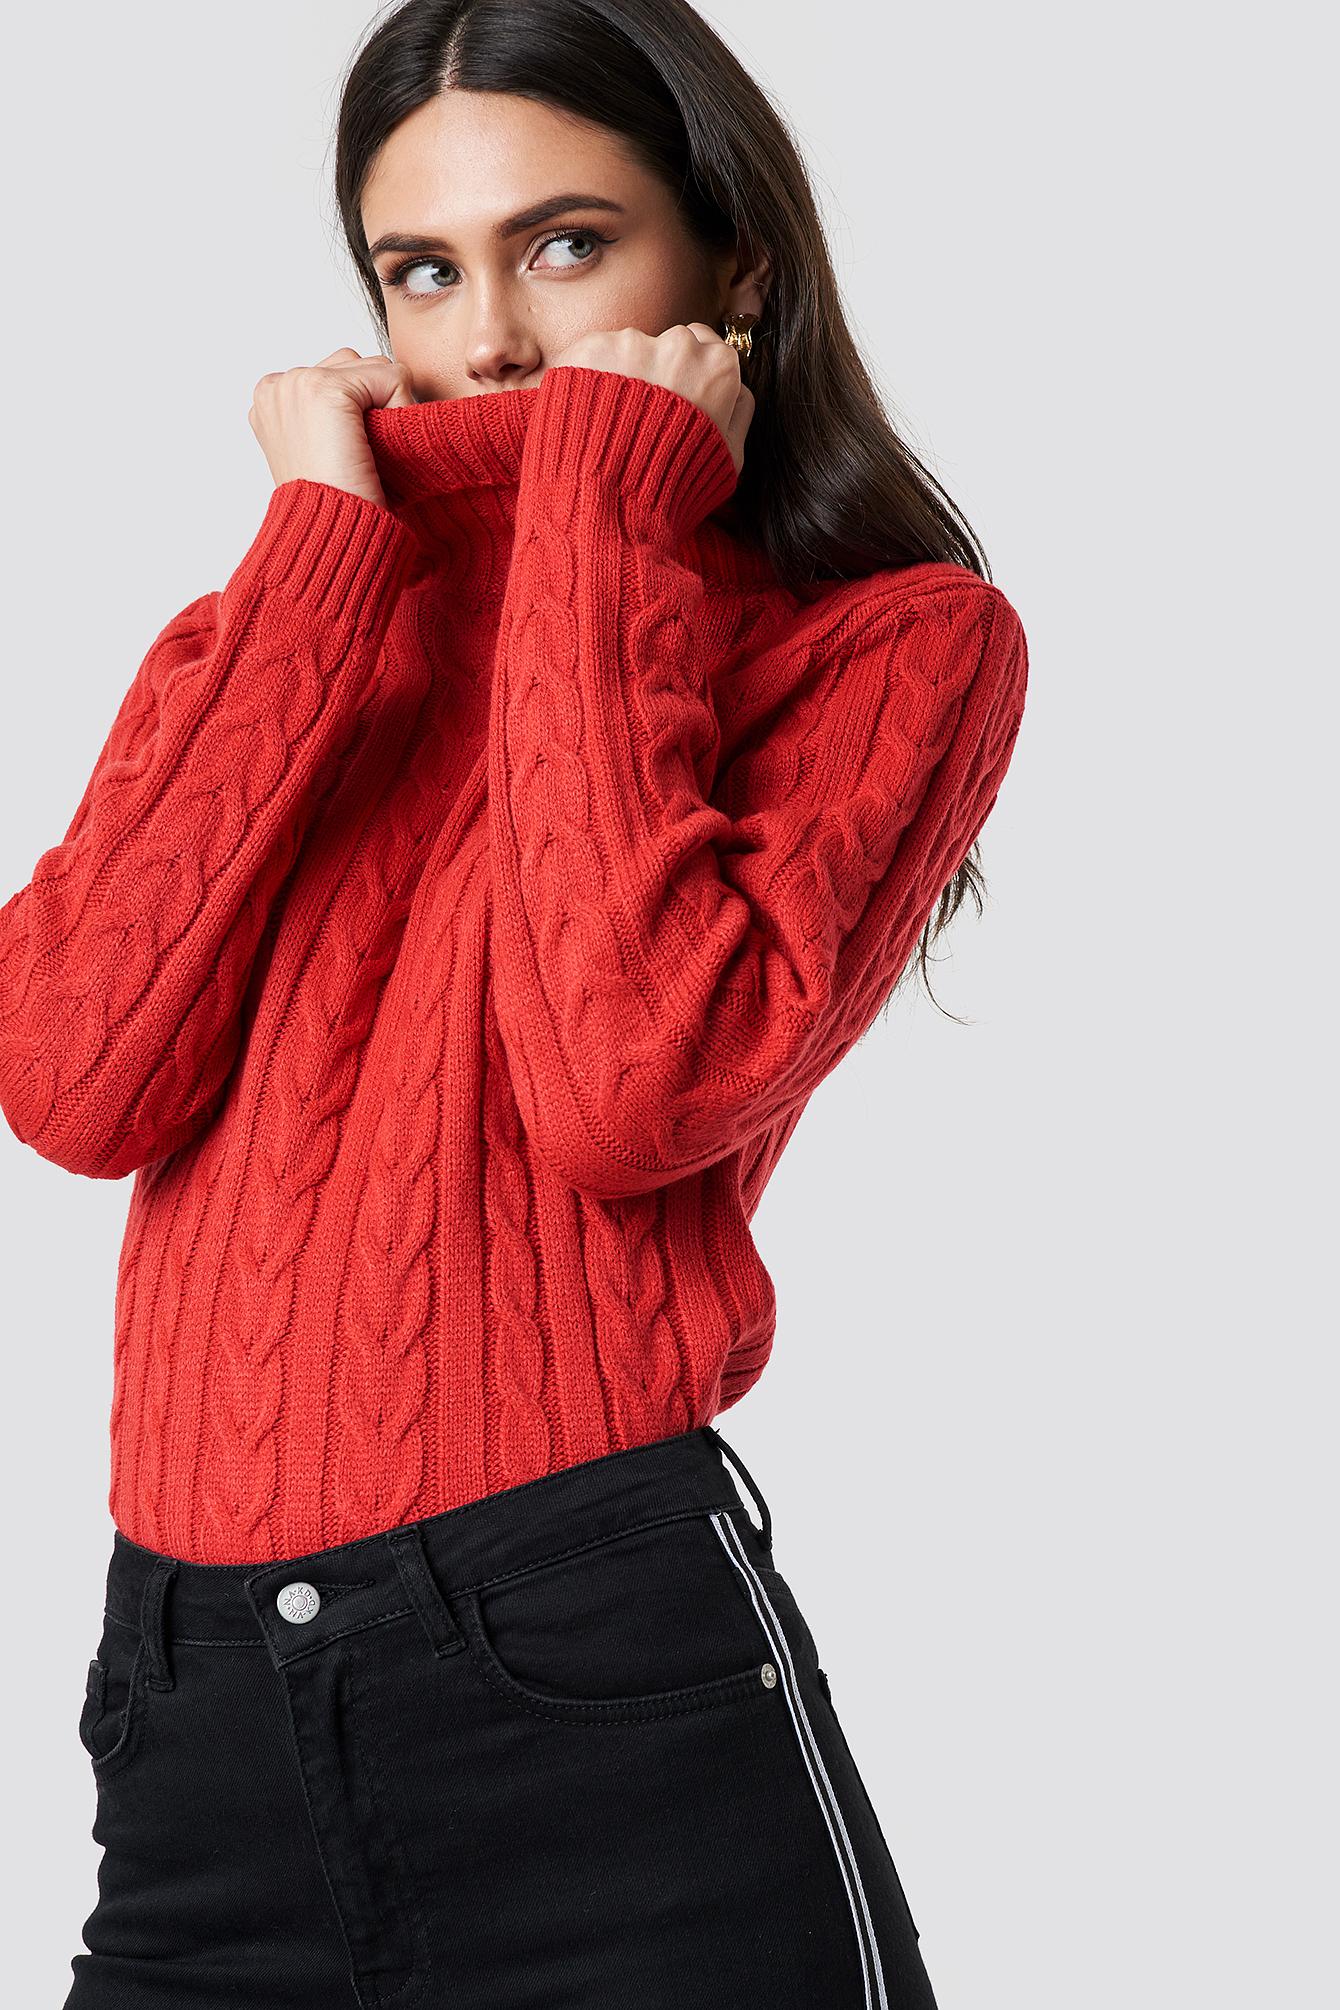 rut&circle -  Polo Braid Knit - Red